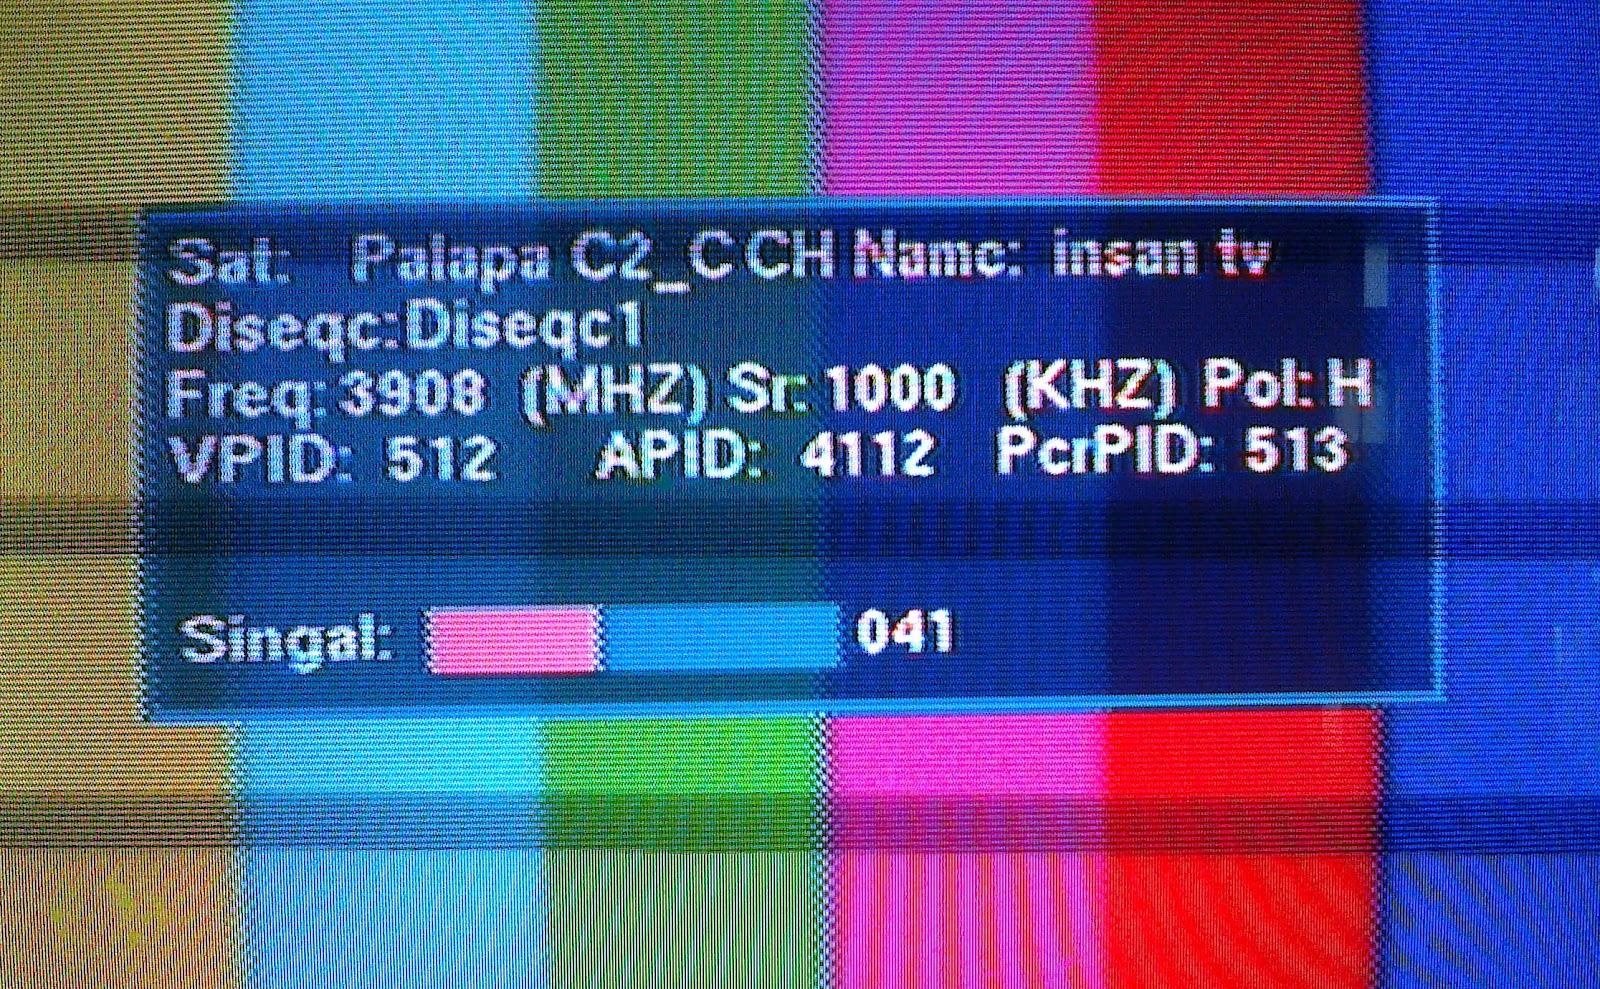 Insan TV